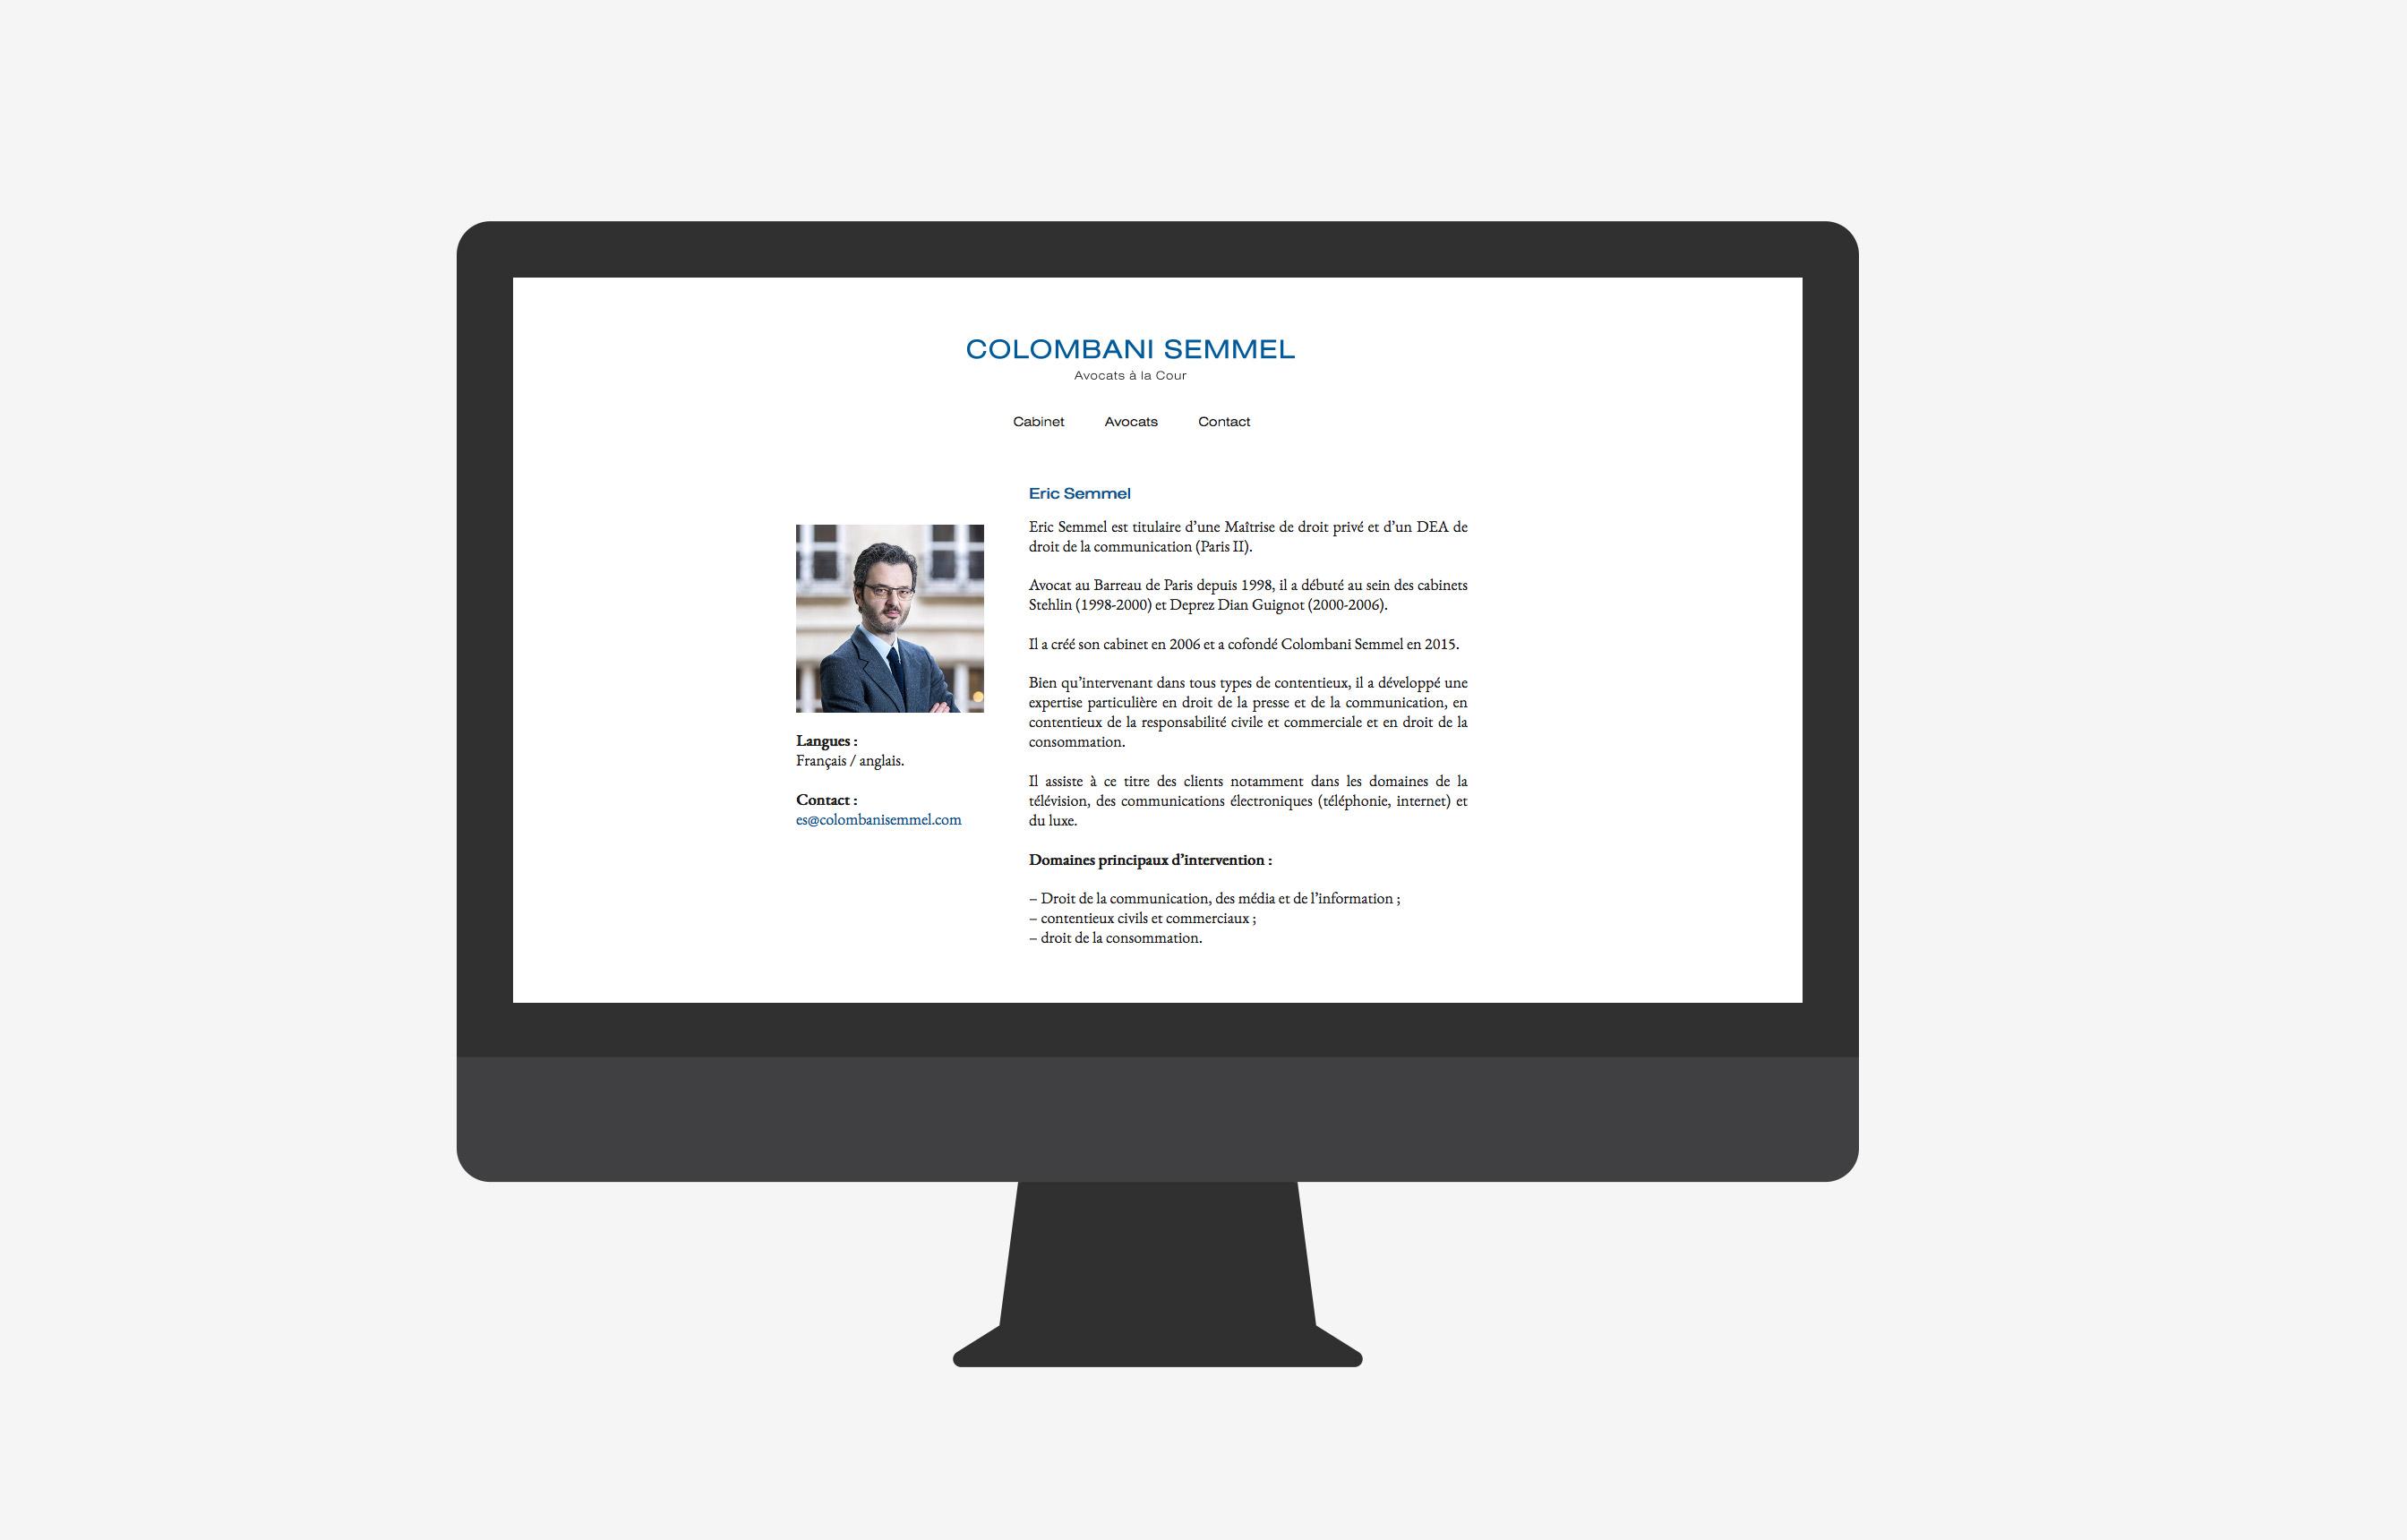 01-colombani-semmel-pikteo-webdesign-graphic-design-freelance-paris-bruxelles-londres